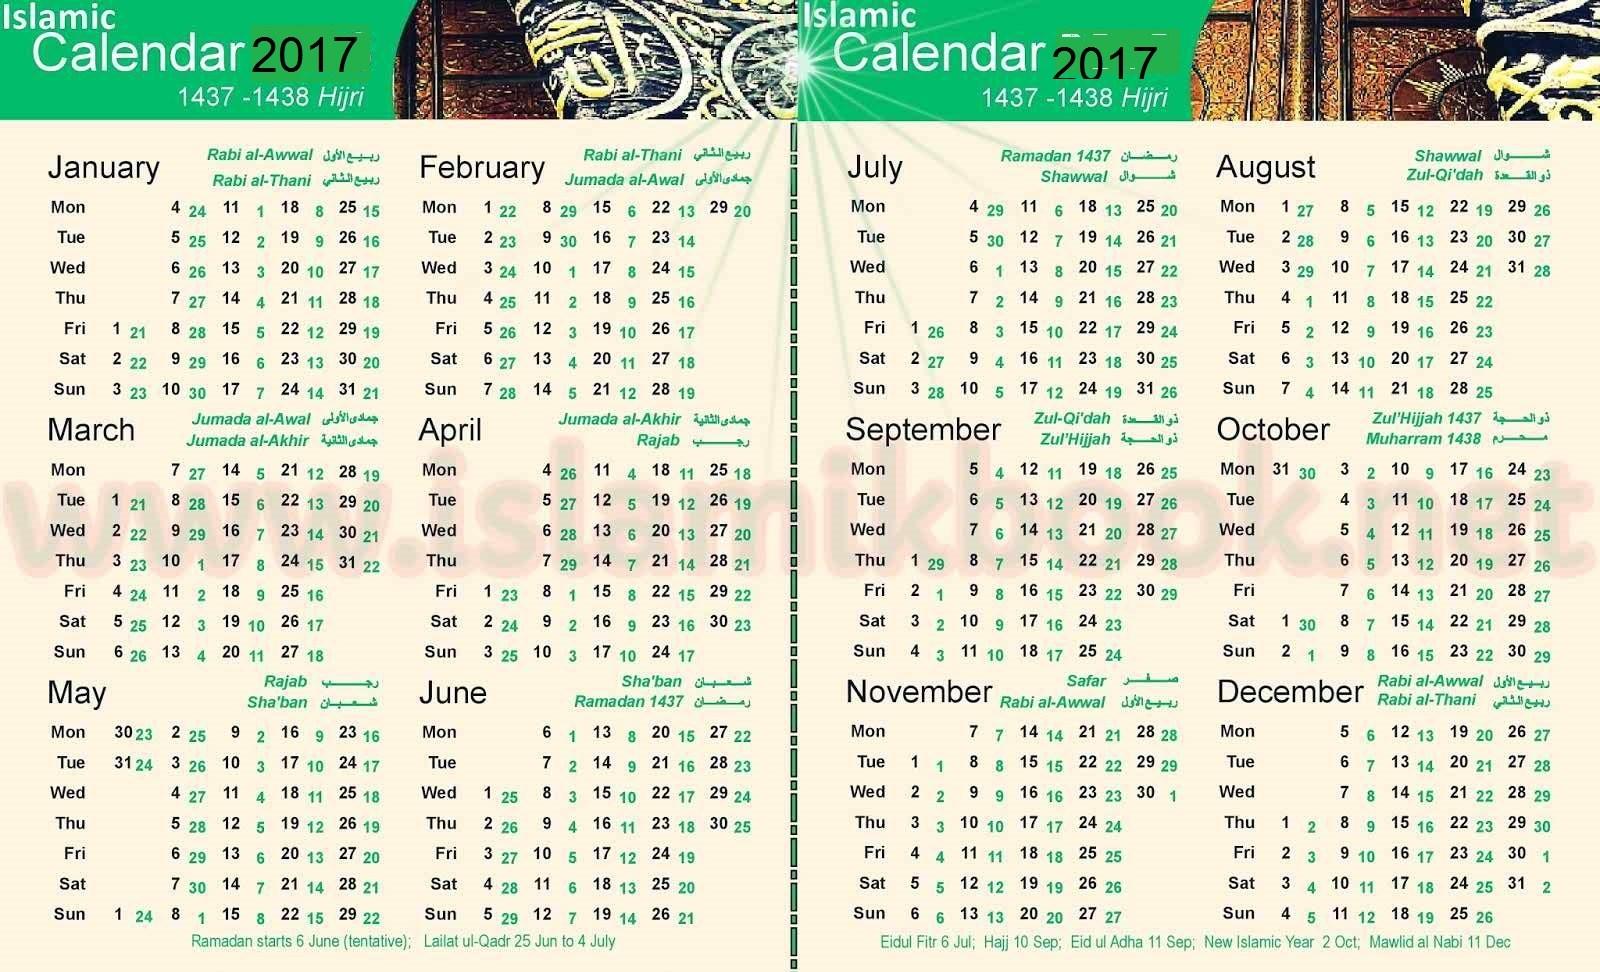 Calendar 2017 Islamic Calendar 2017 Islamic Calendar 2017 2017